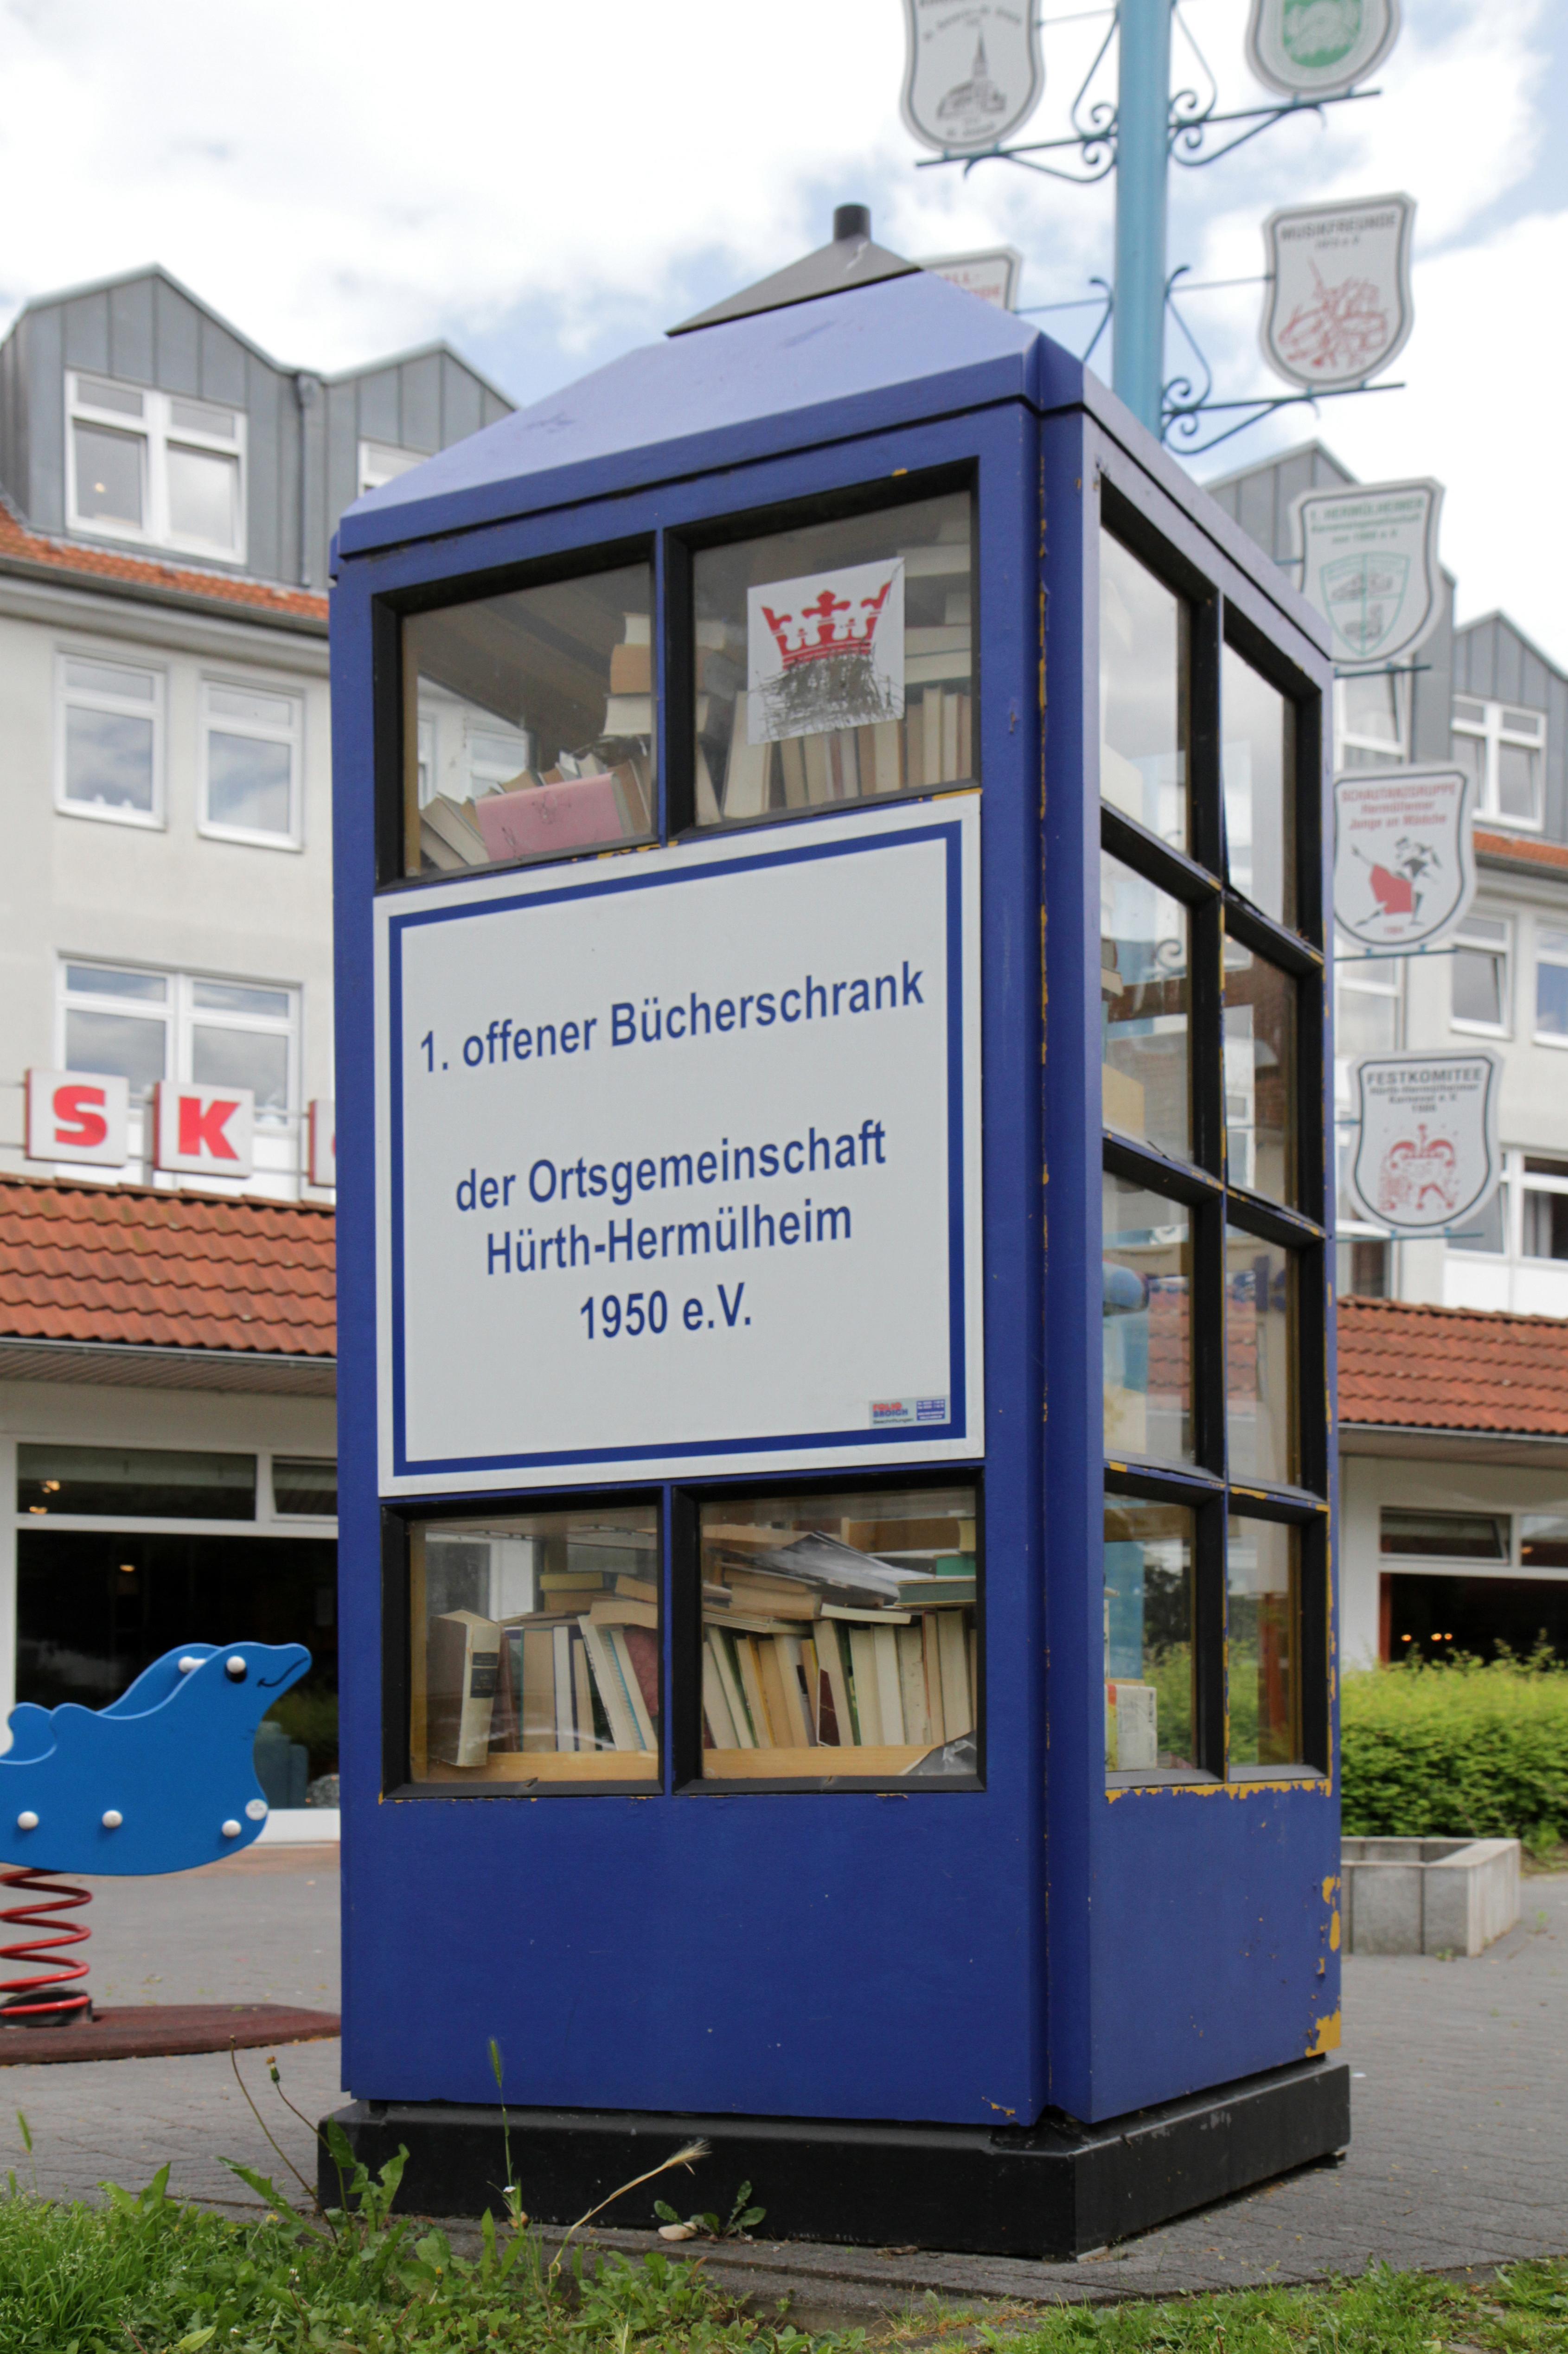 File:Offener Bücherschrank Hürth-Hermülheim b.jpg - Wikimedia Commons